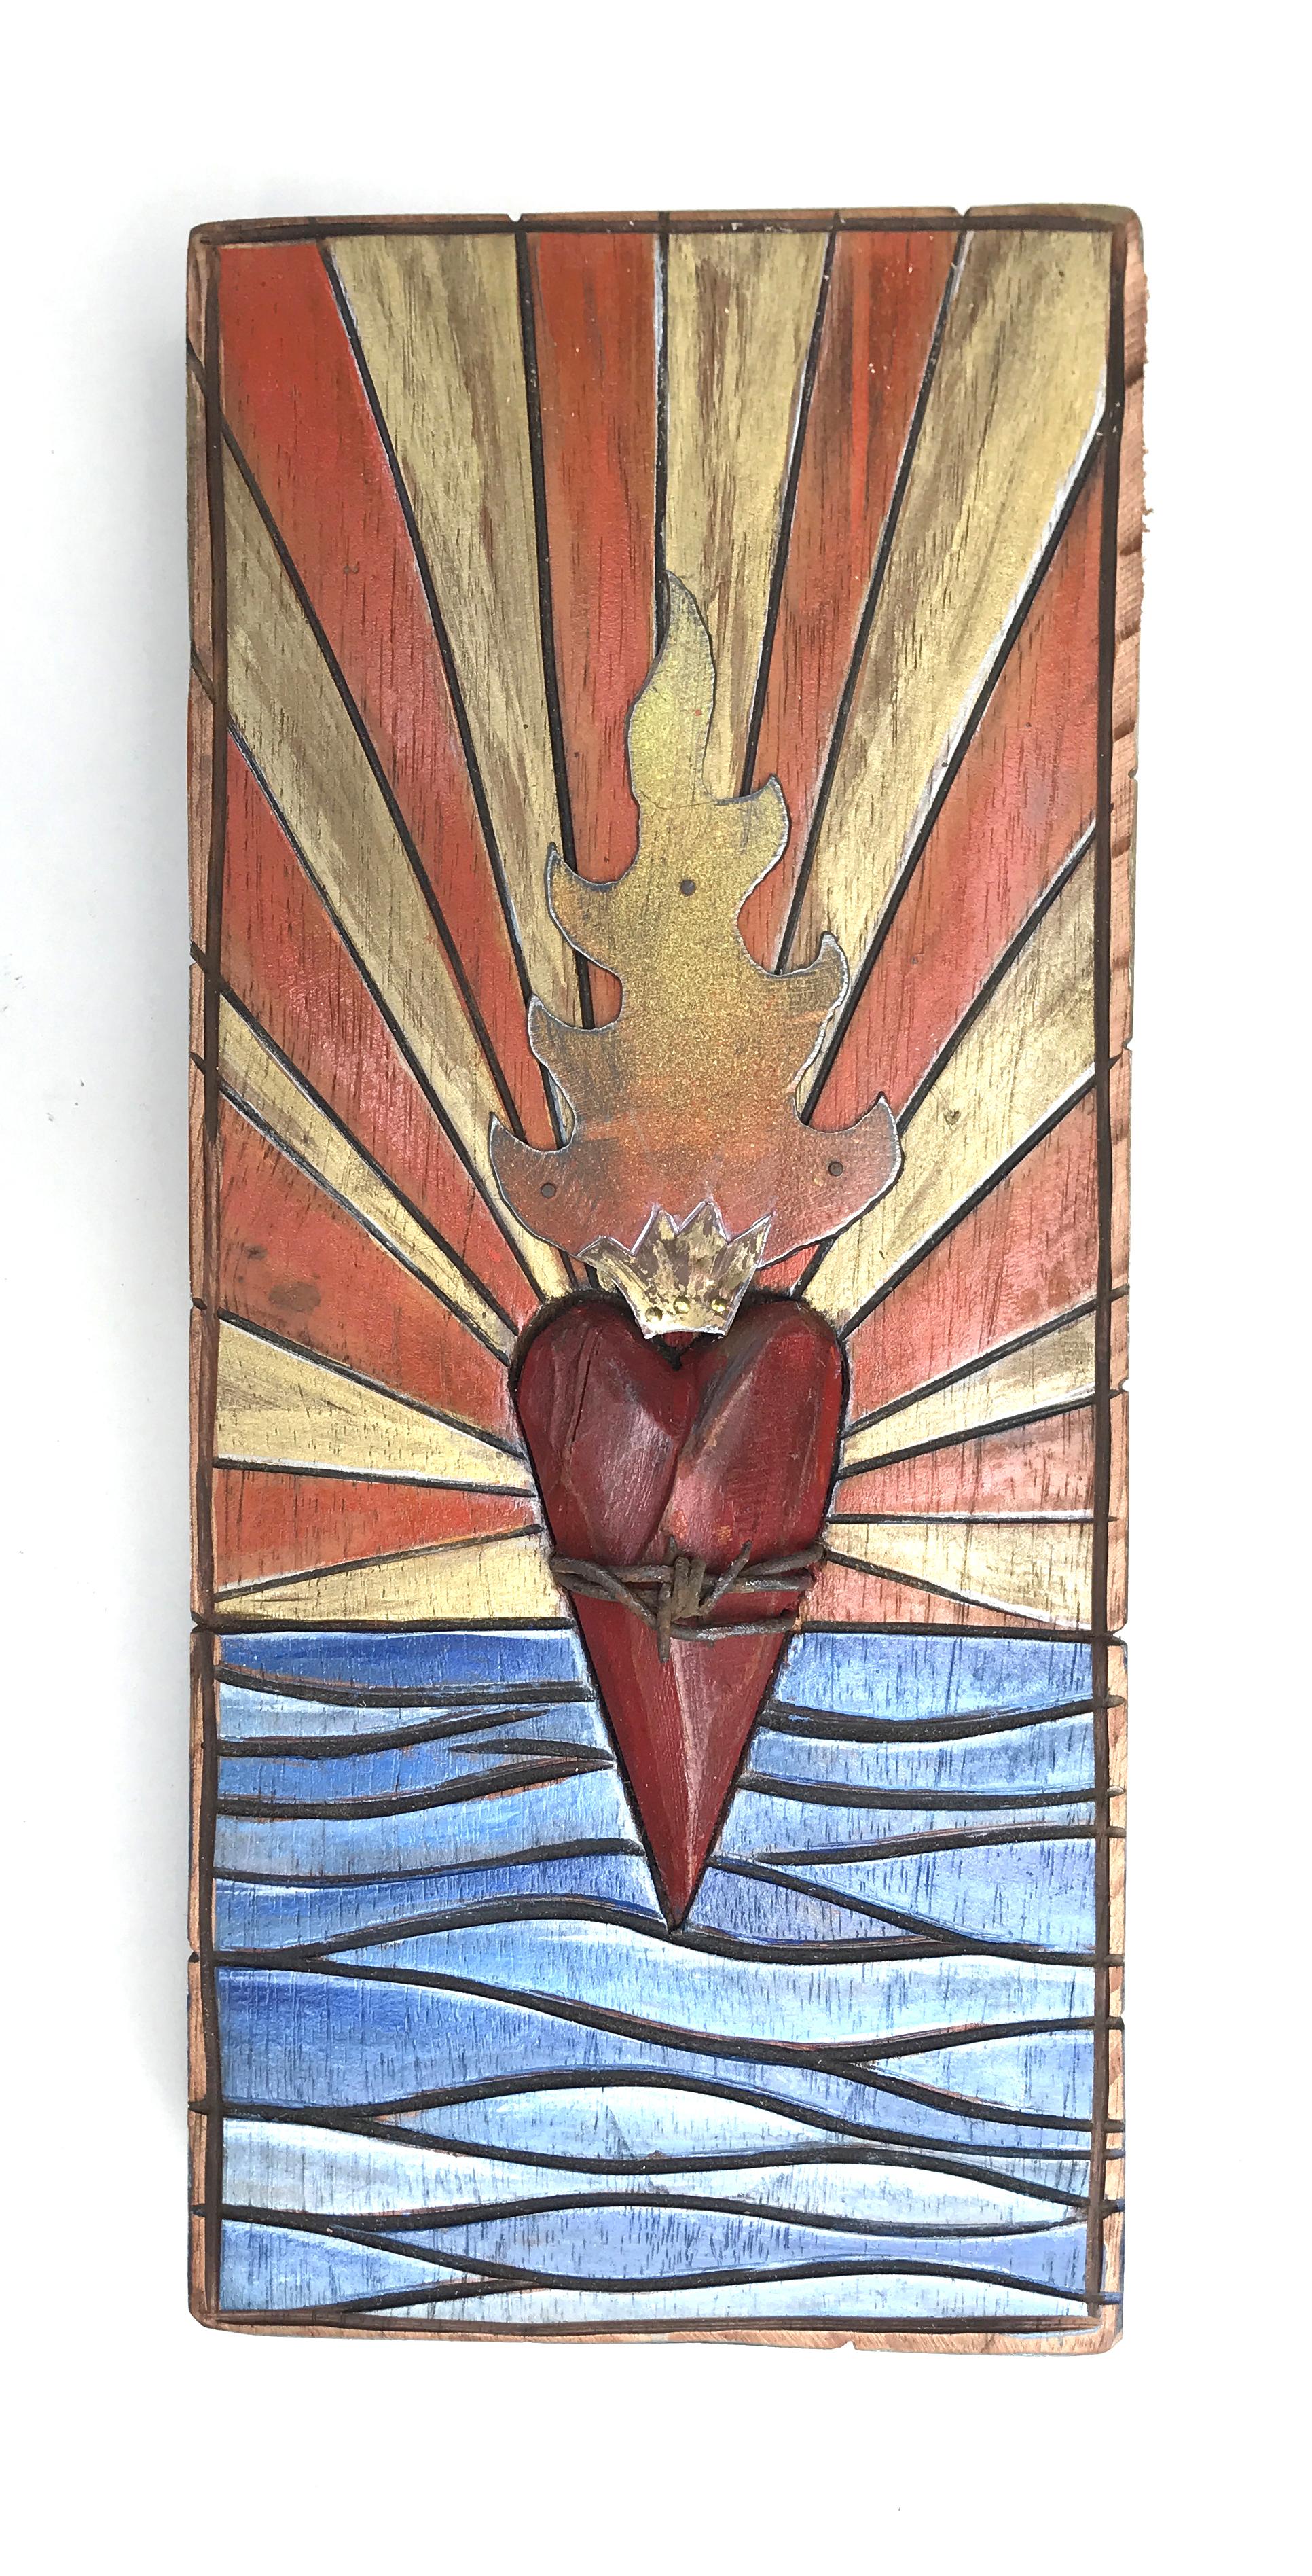 Sacred heart with risingsun-02.JPG